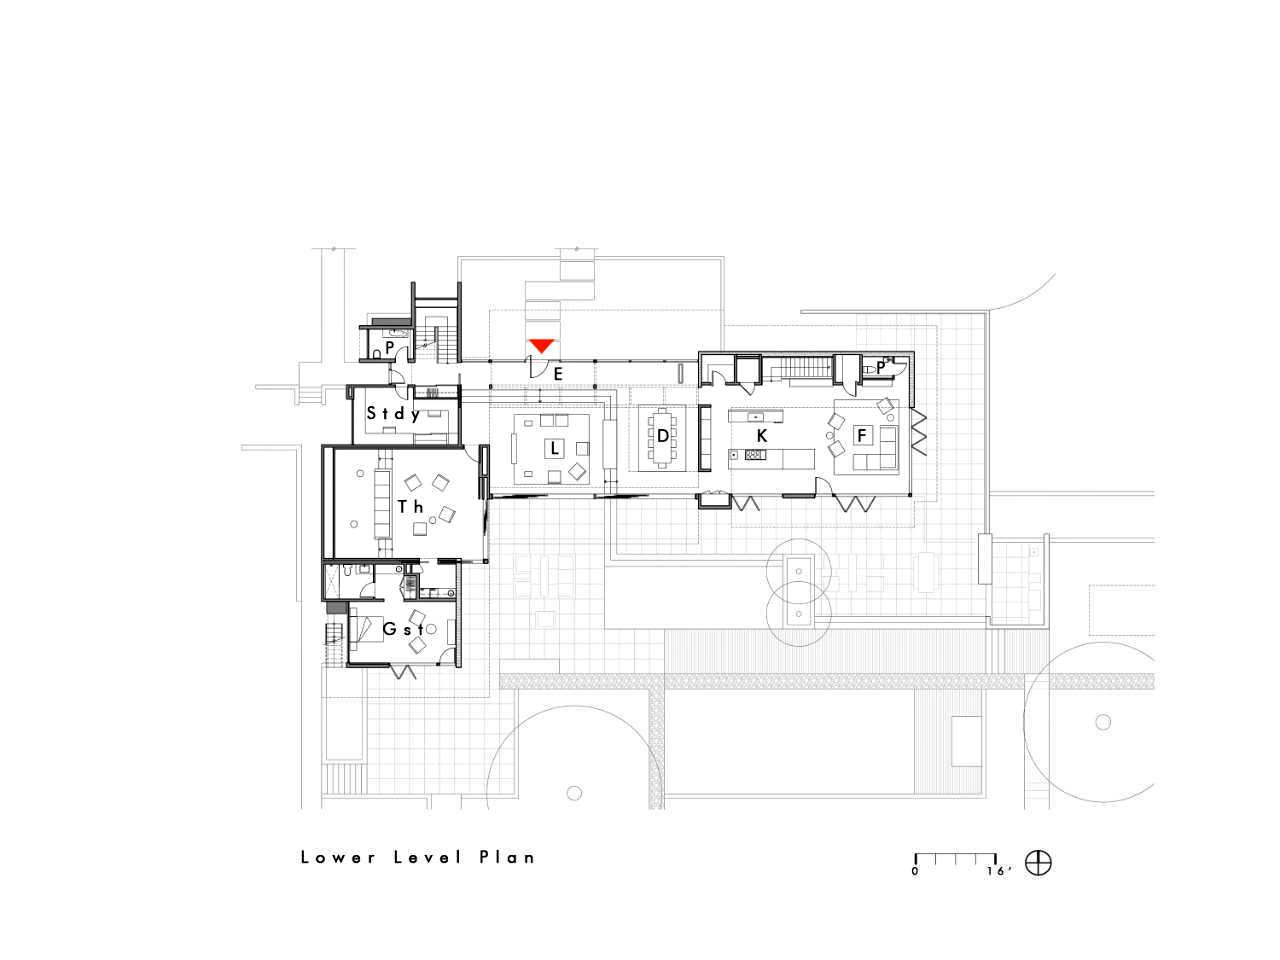 Lower Level Floor Plan – Modern Luxury OZ Residence – 92 Sutherland Drive, Atherton, CA, USA